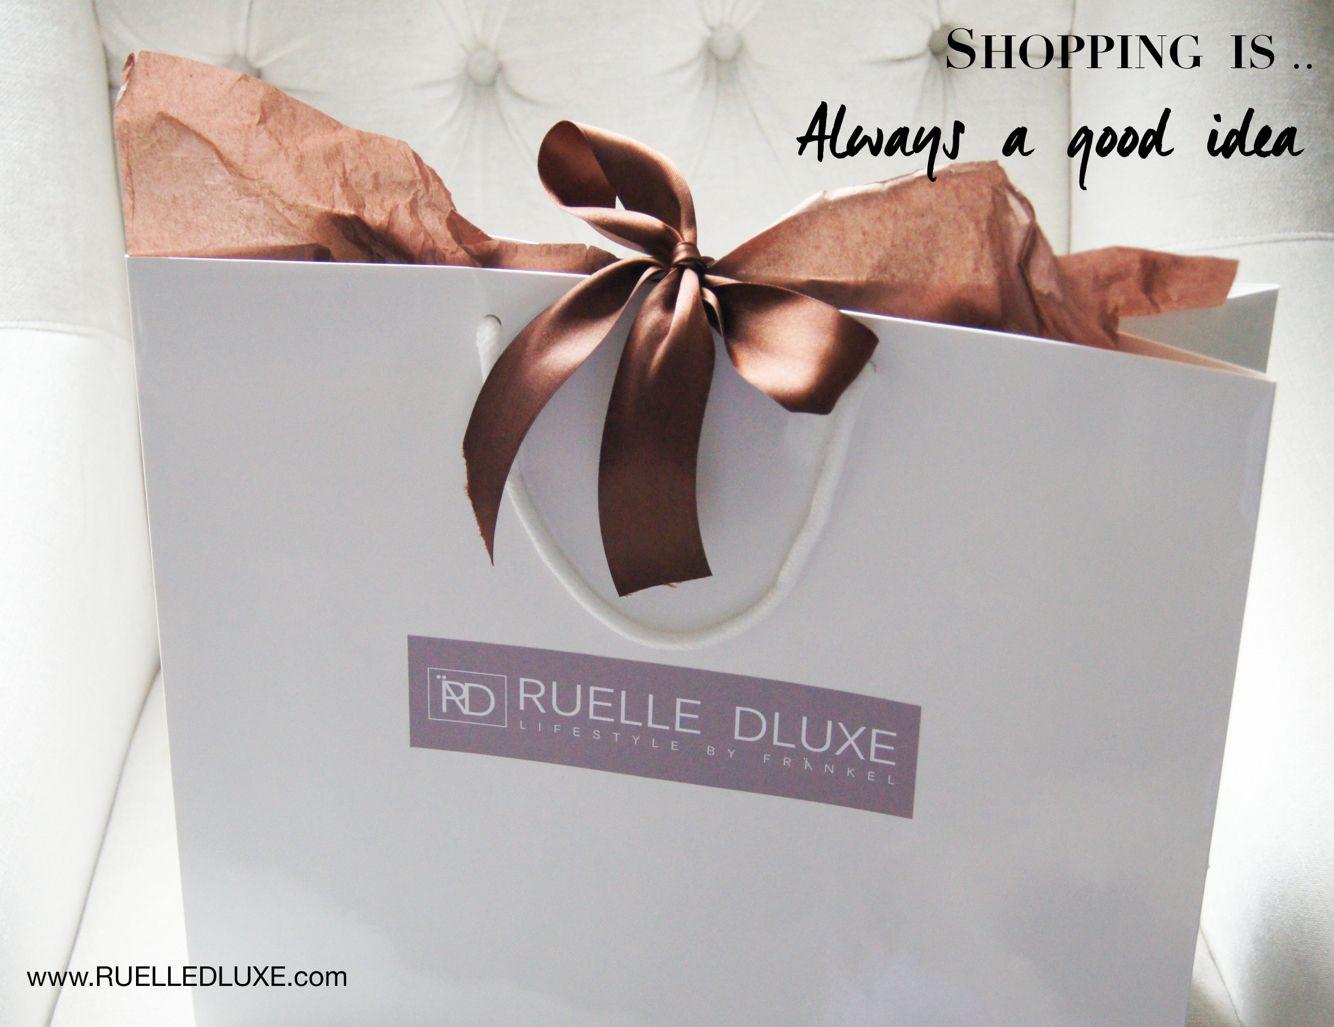 Just saying...www.ruelledluxe.com